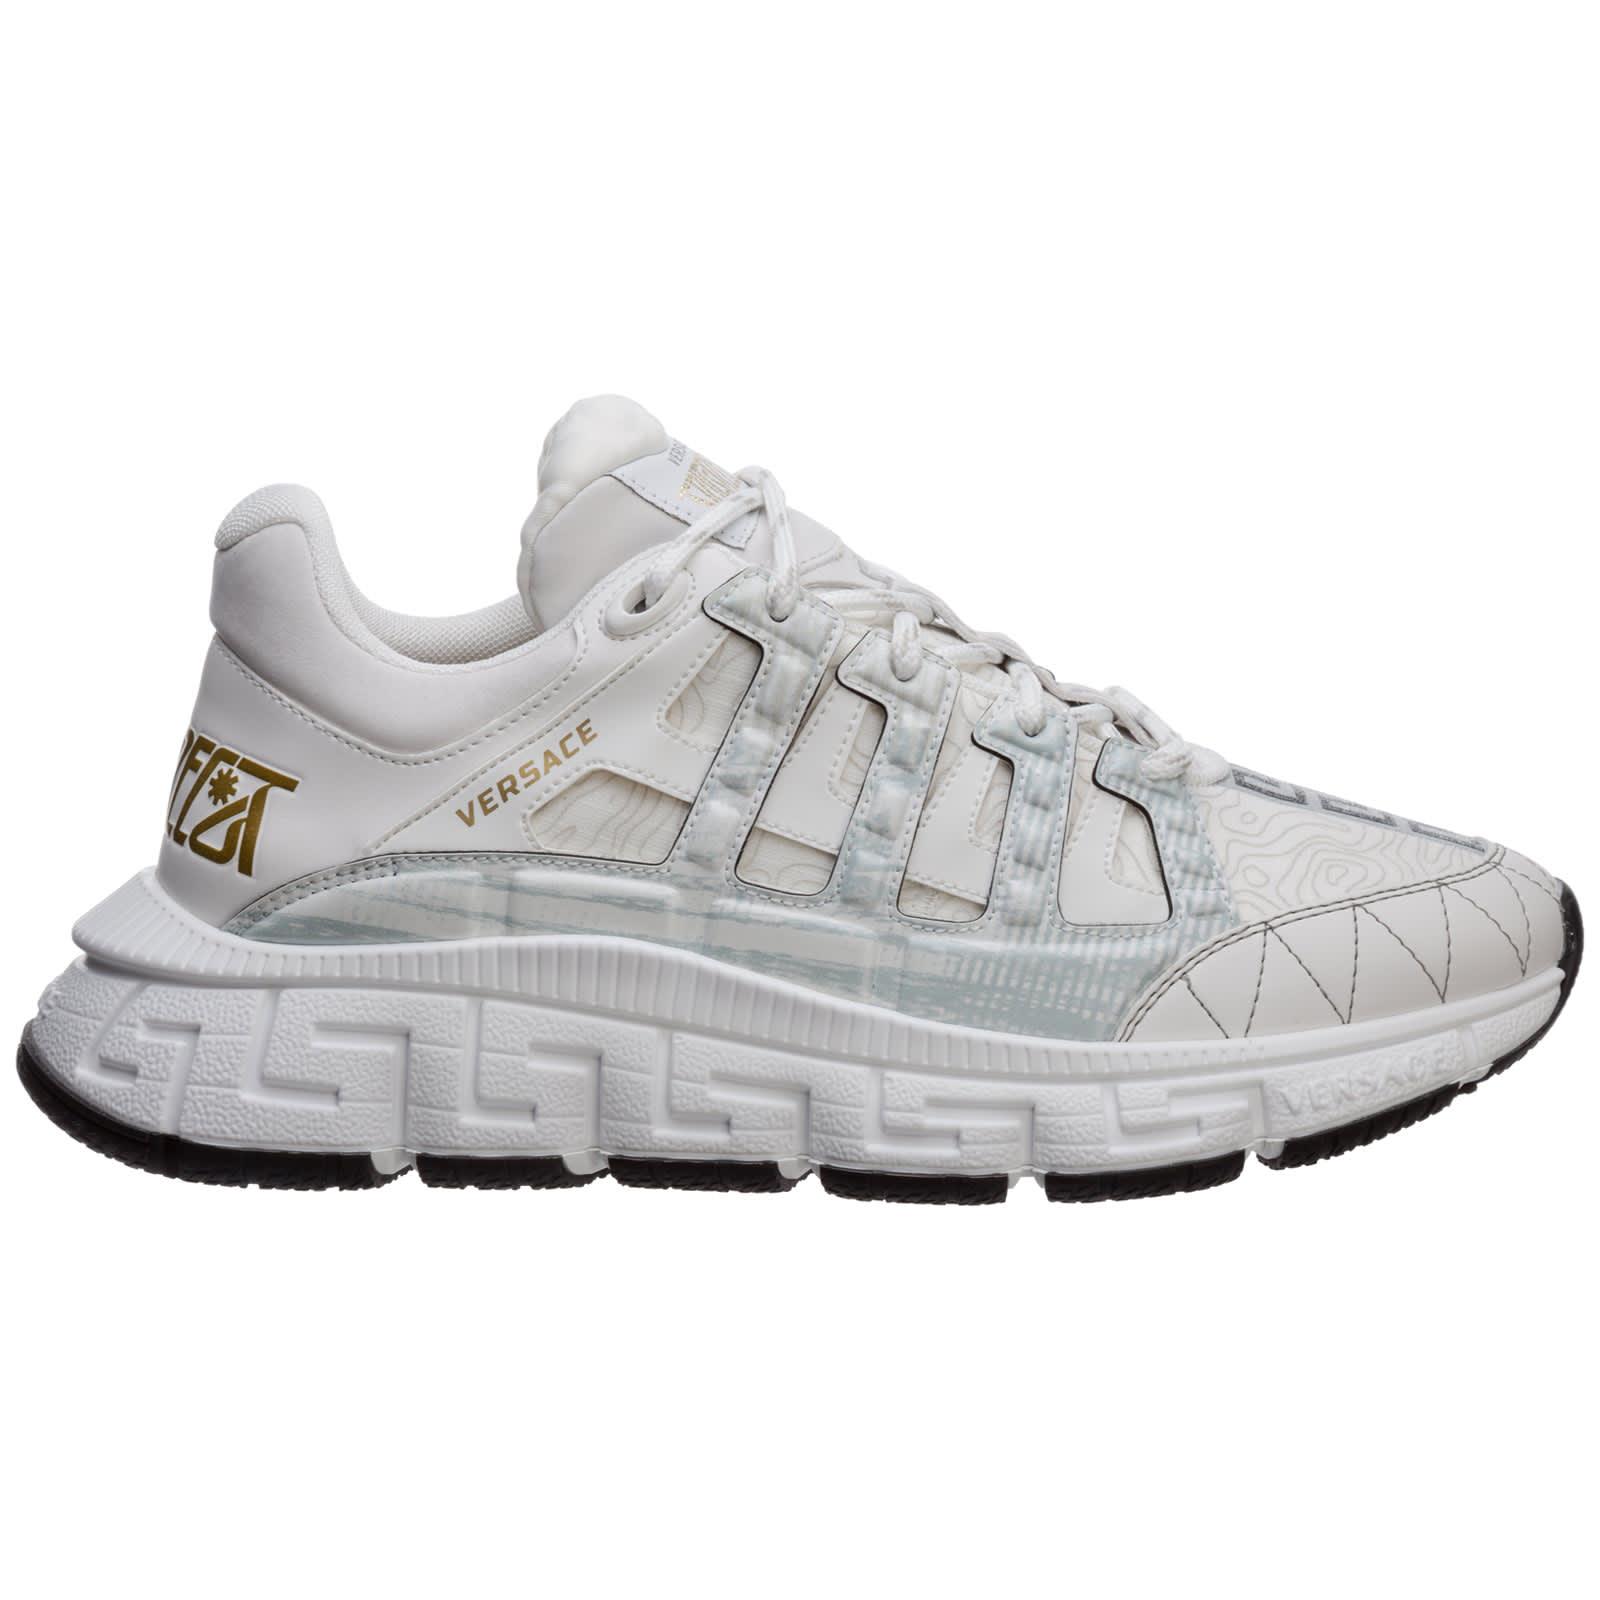 Versace Sneakers TRIGRECA SNEAKERS